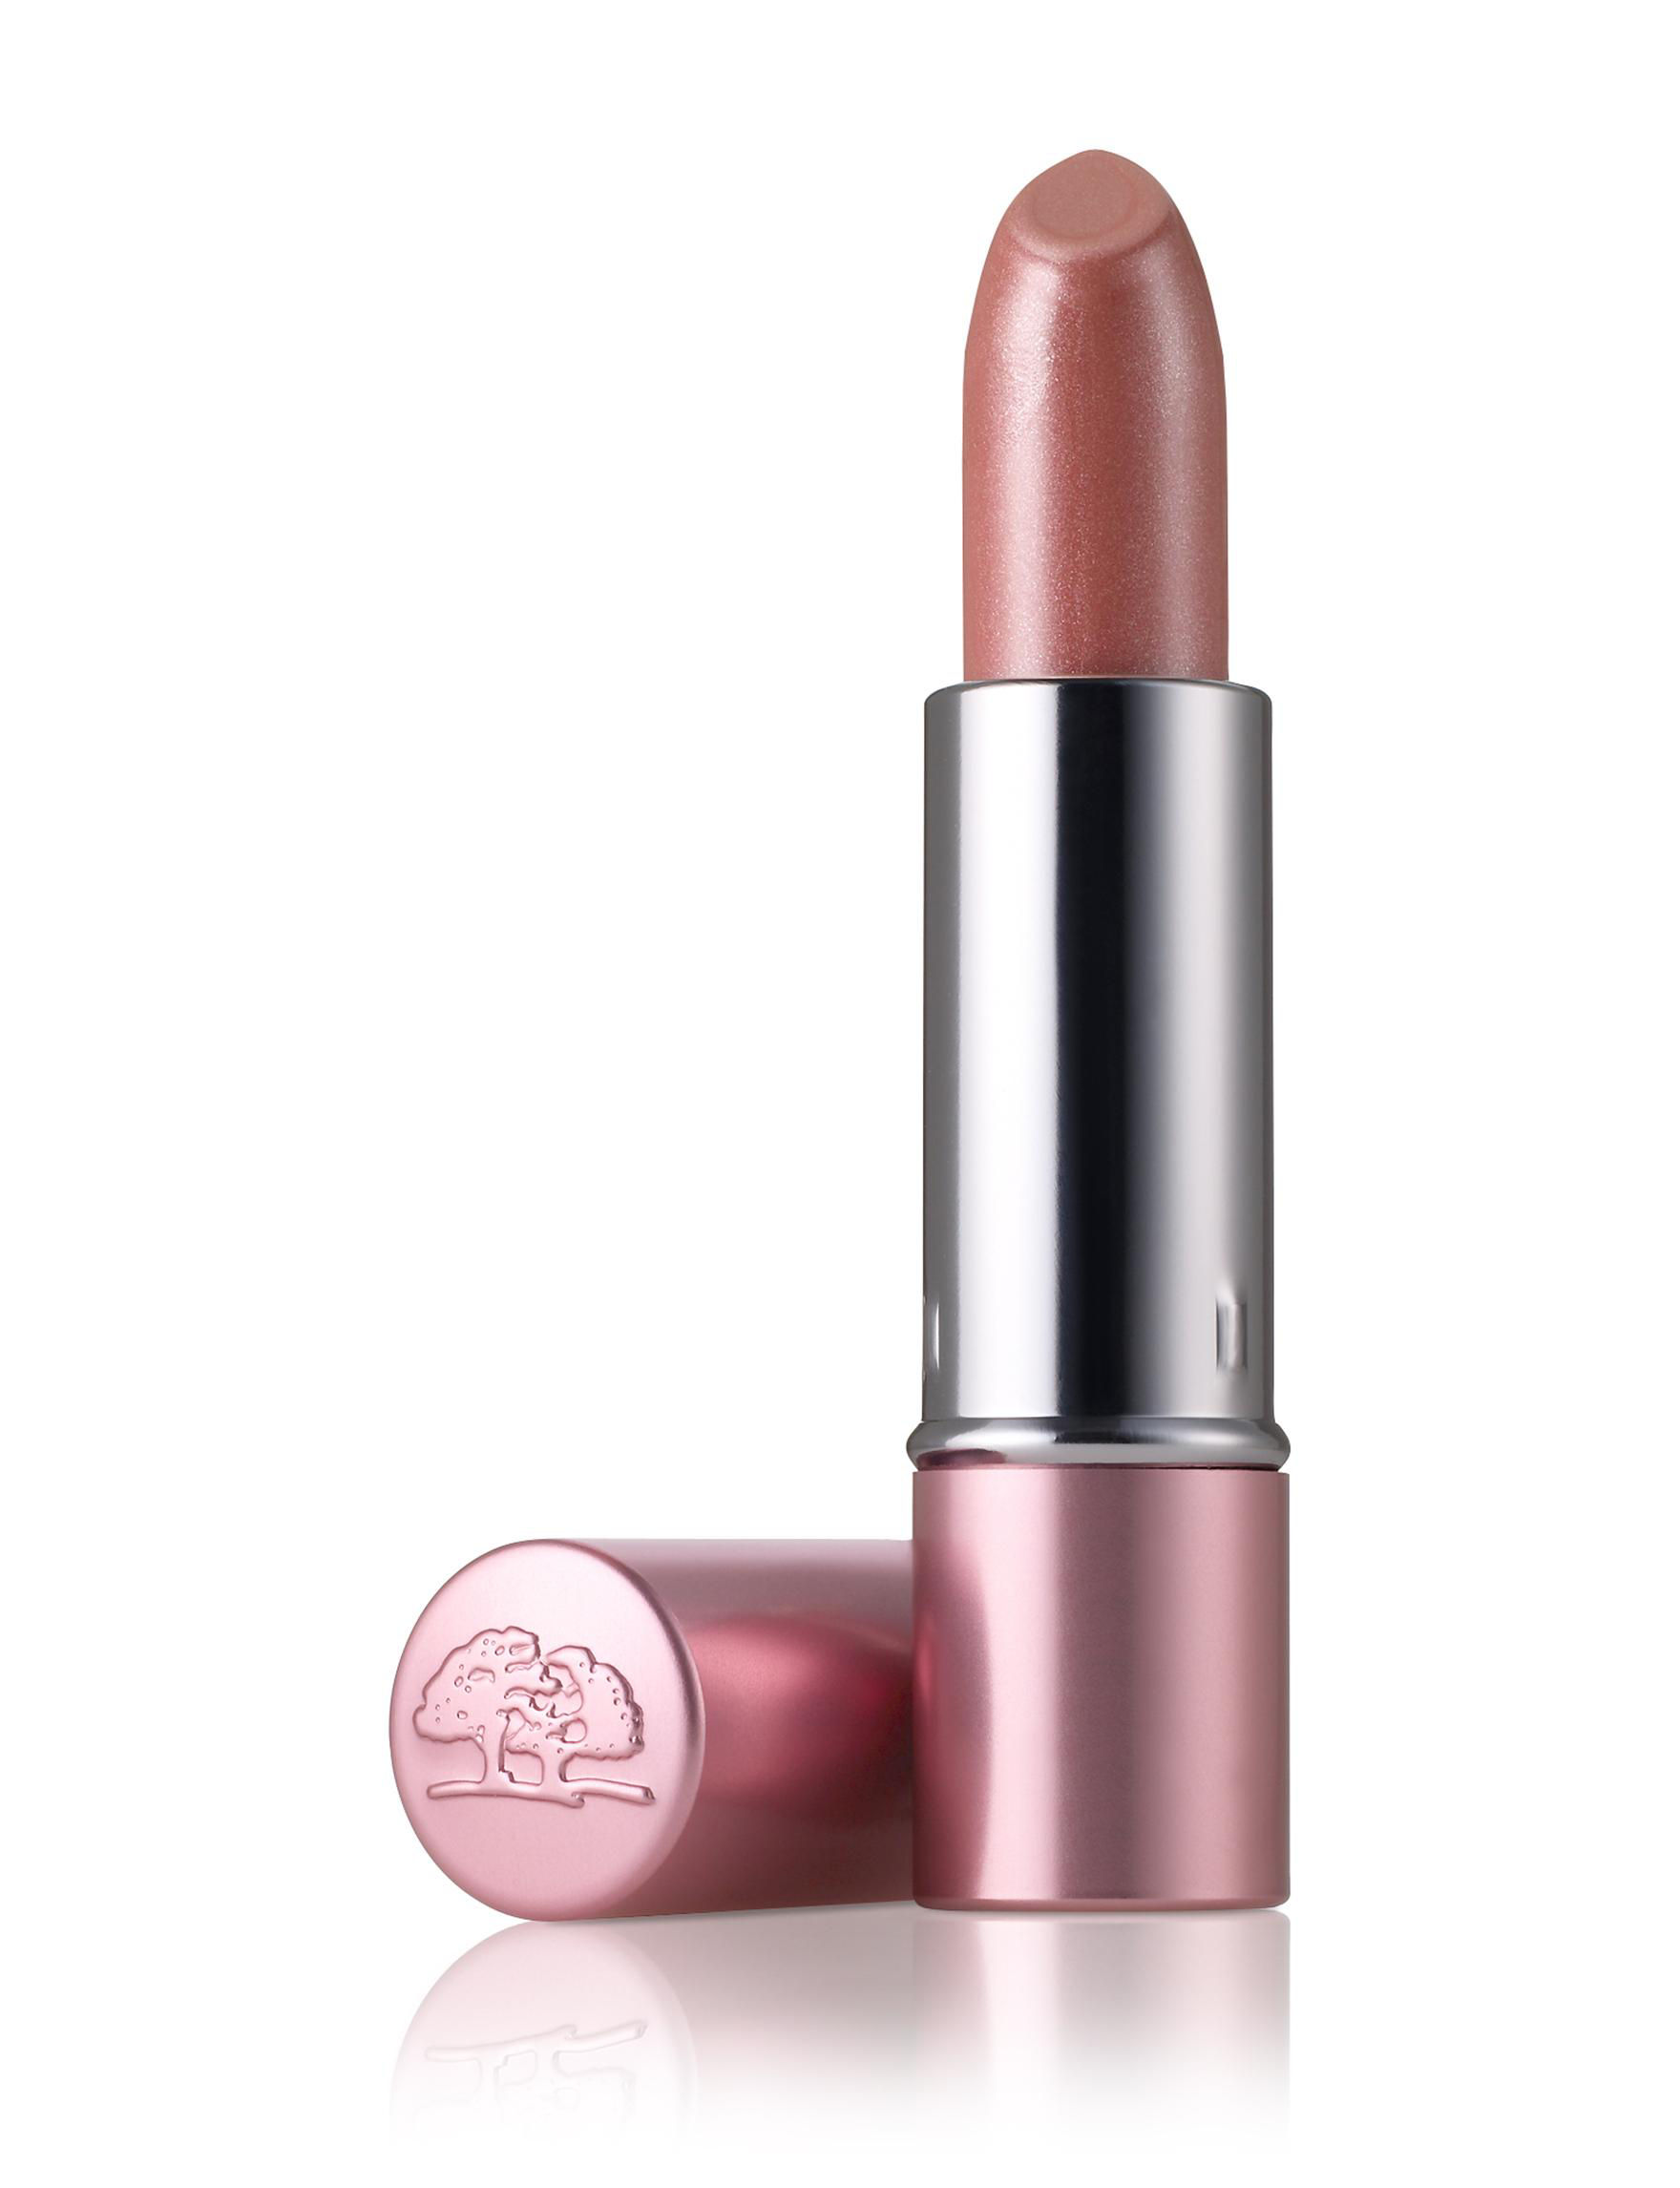 Origins Marigold Lipstick